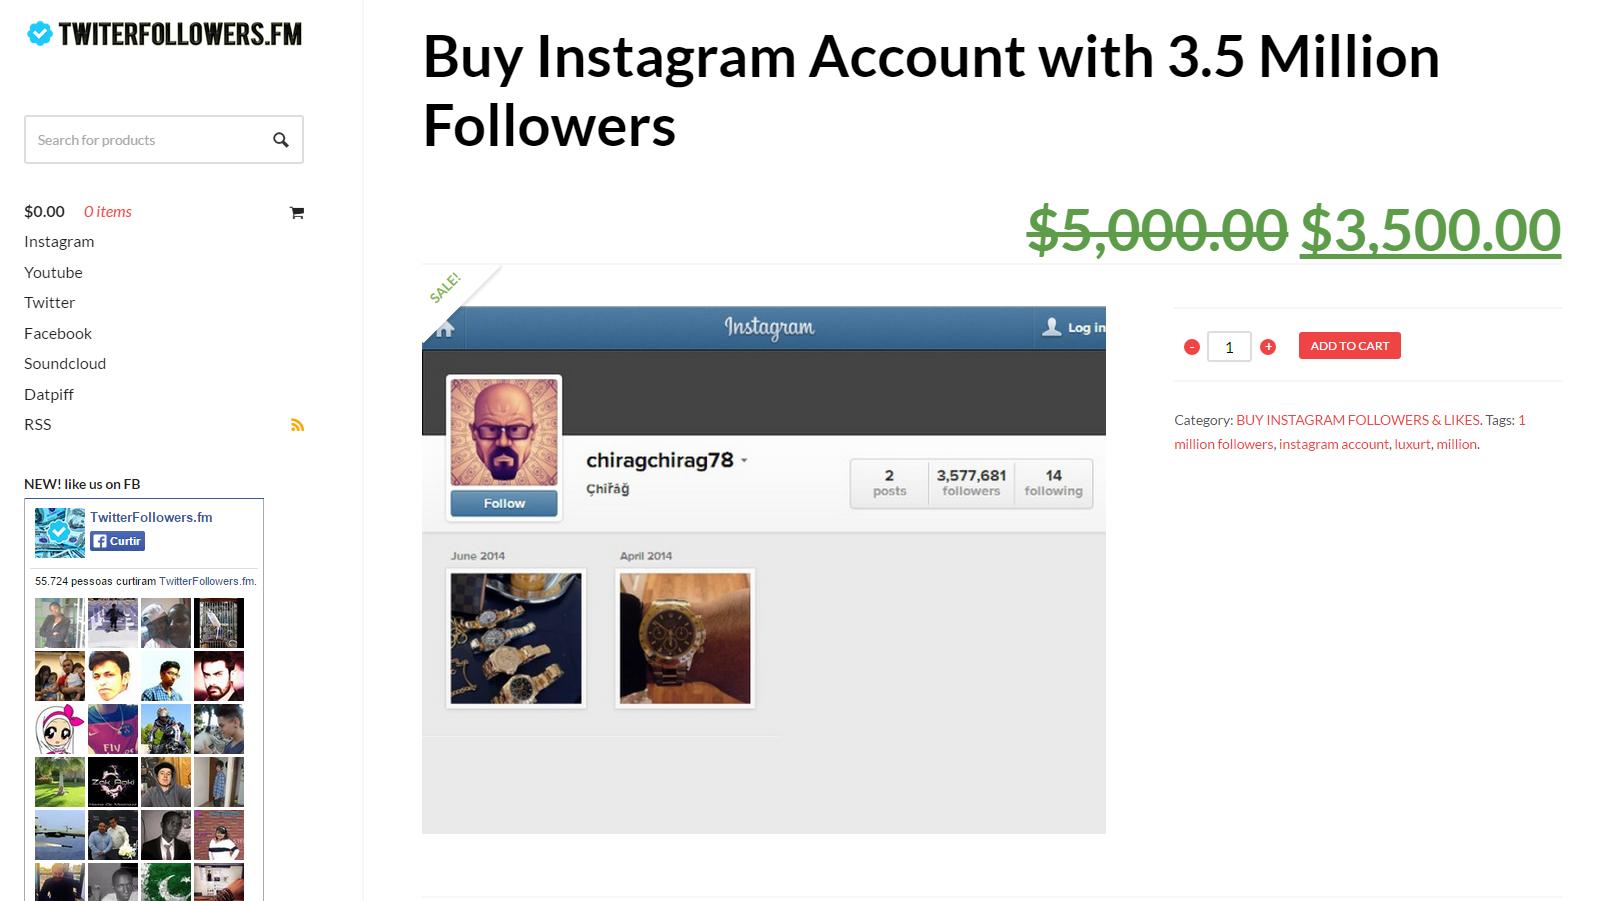 Comprar seguidores no Instagram e outras redes